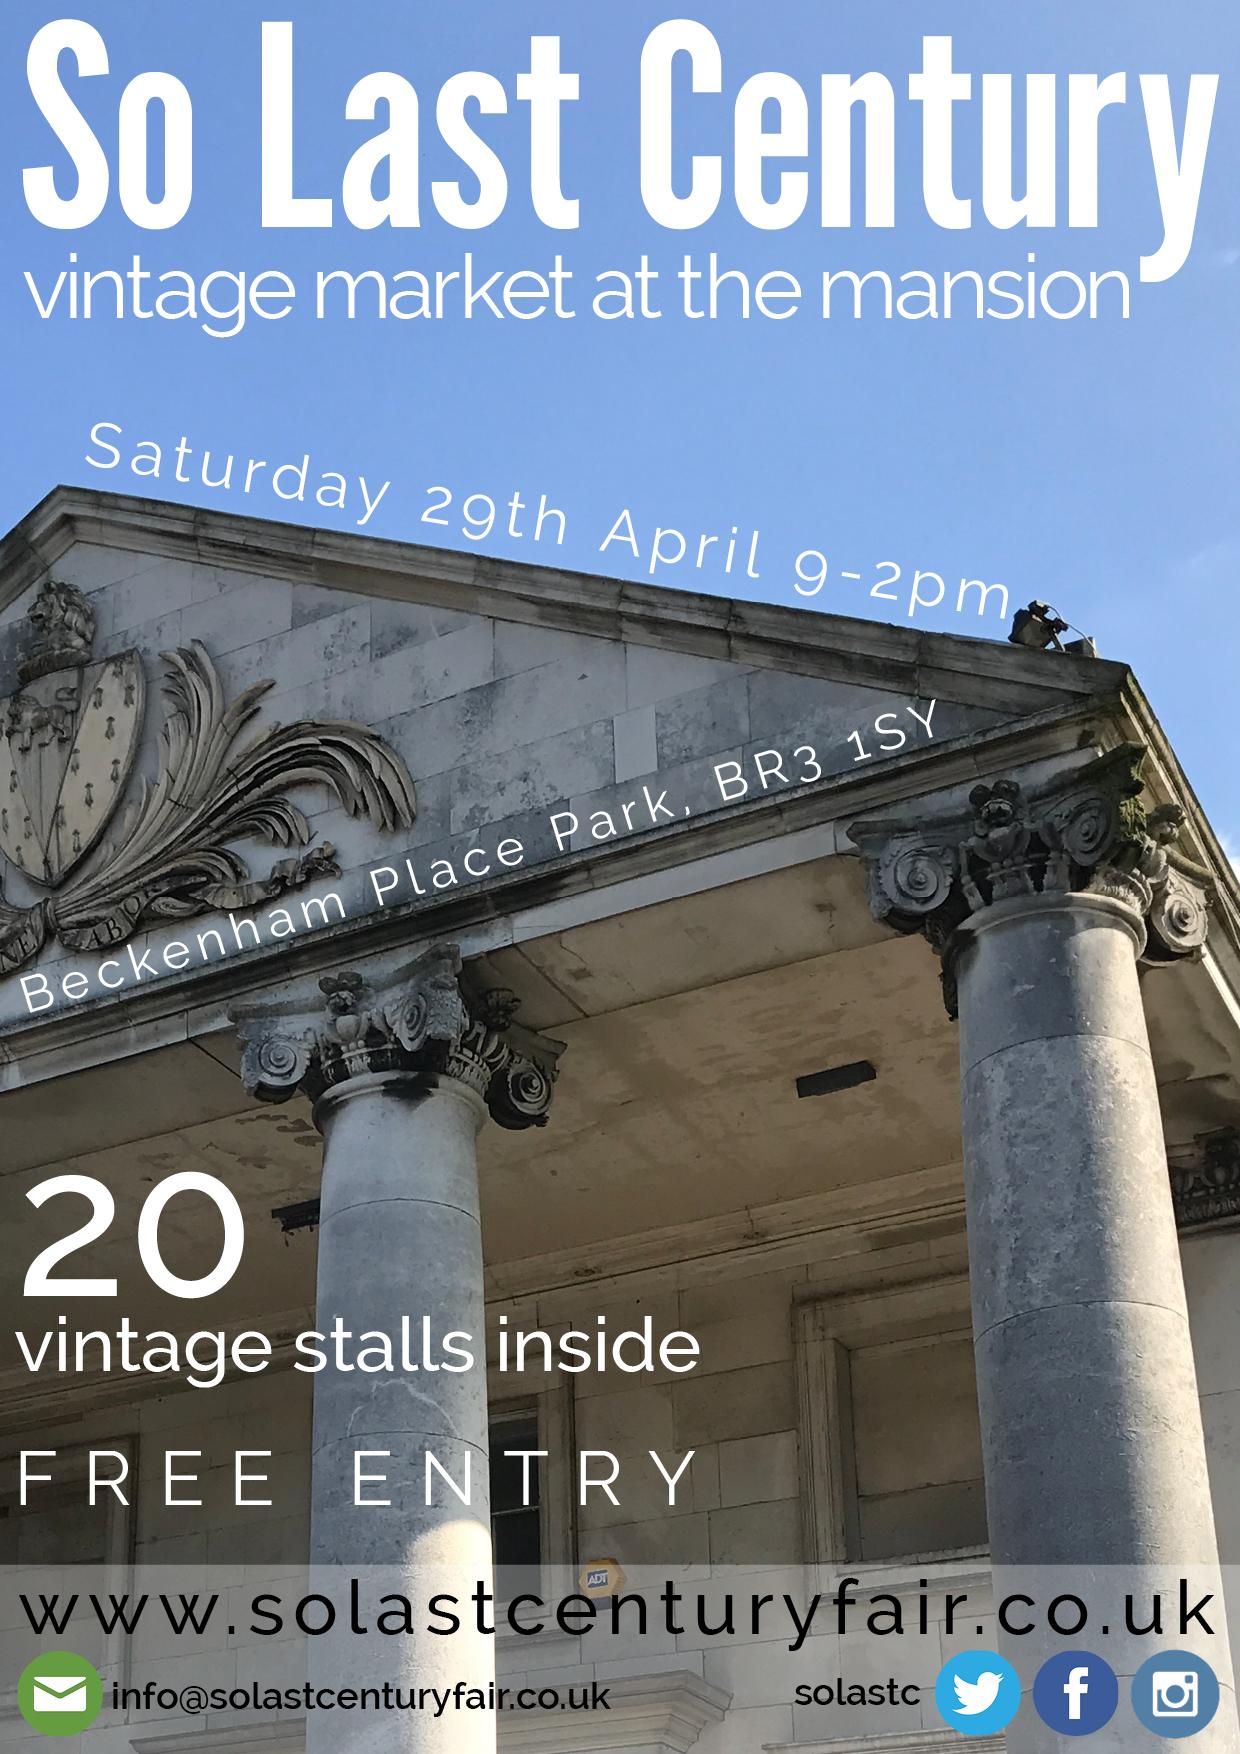 12 Poster Apr 2017 Mansion.jpg